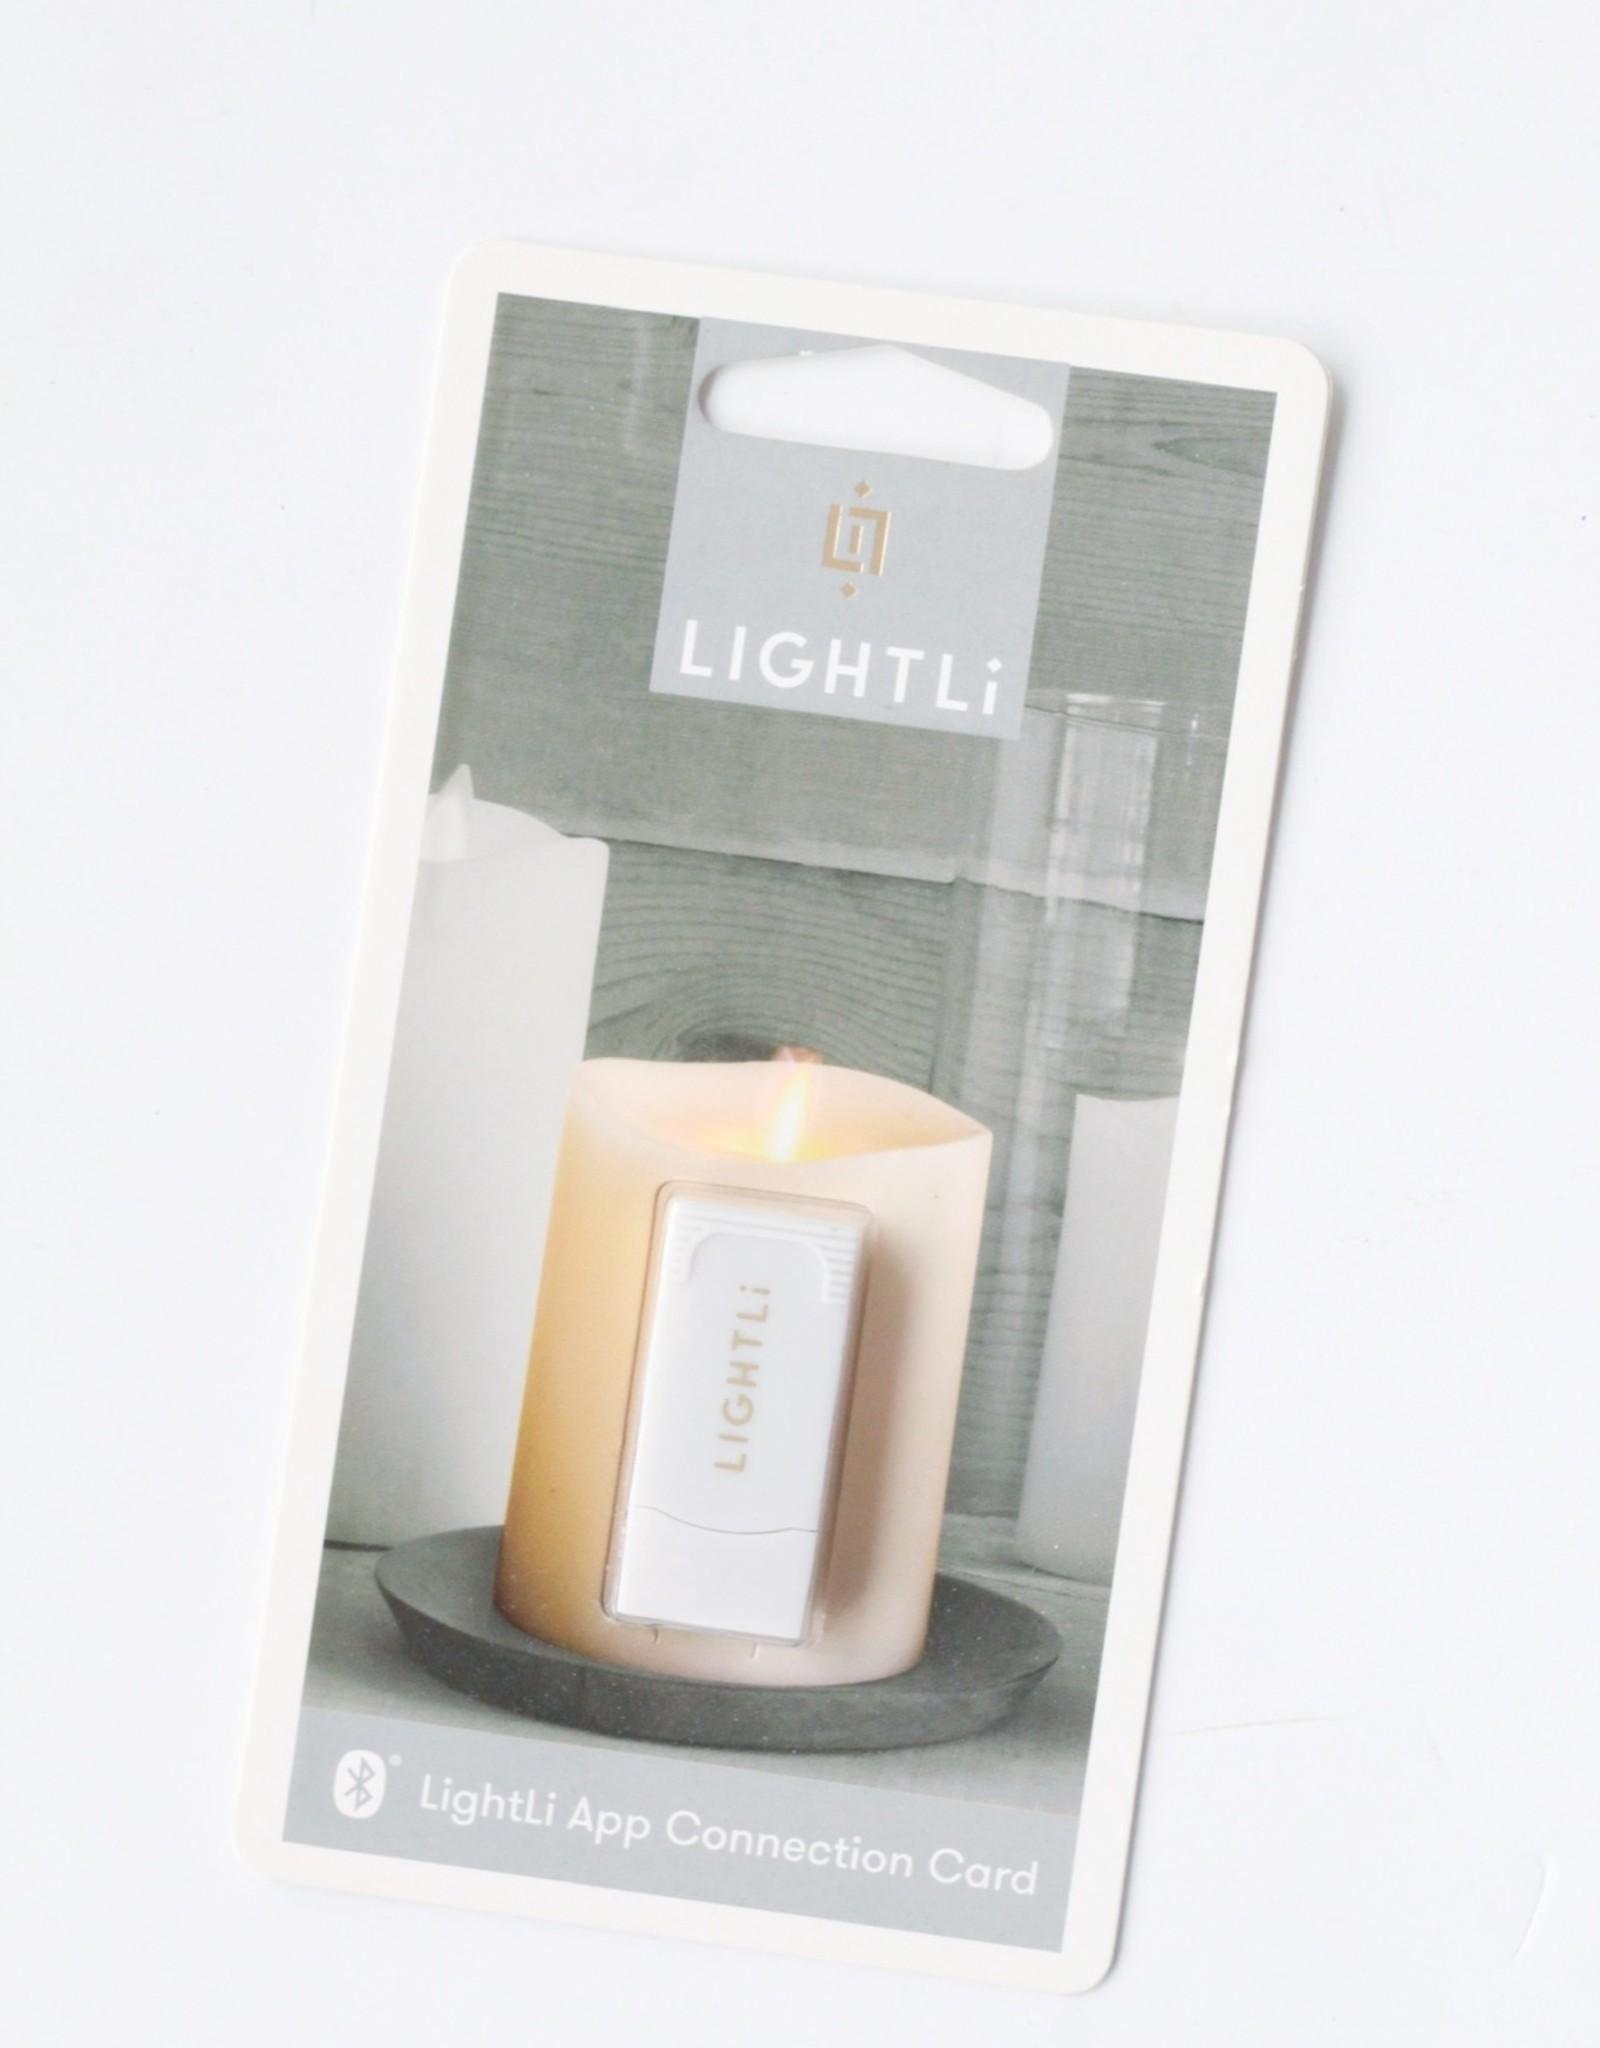 Lightli Bluetooth Connection Card